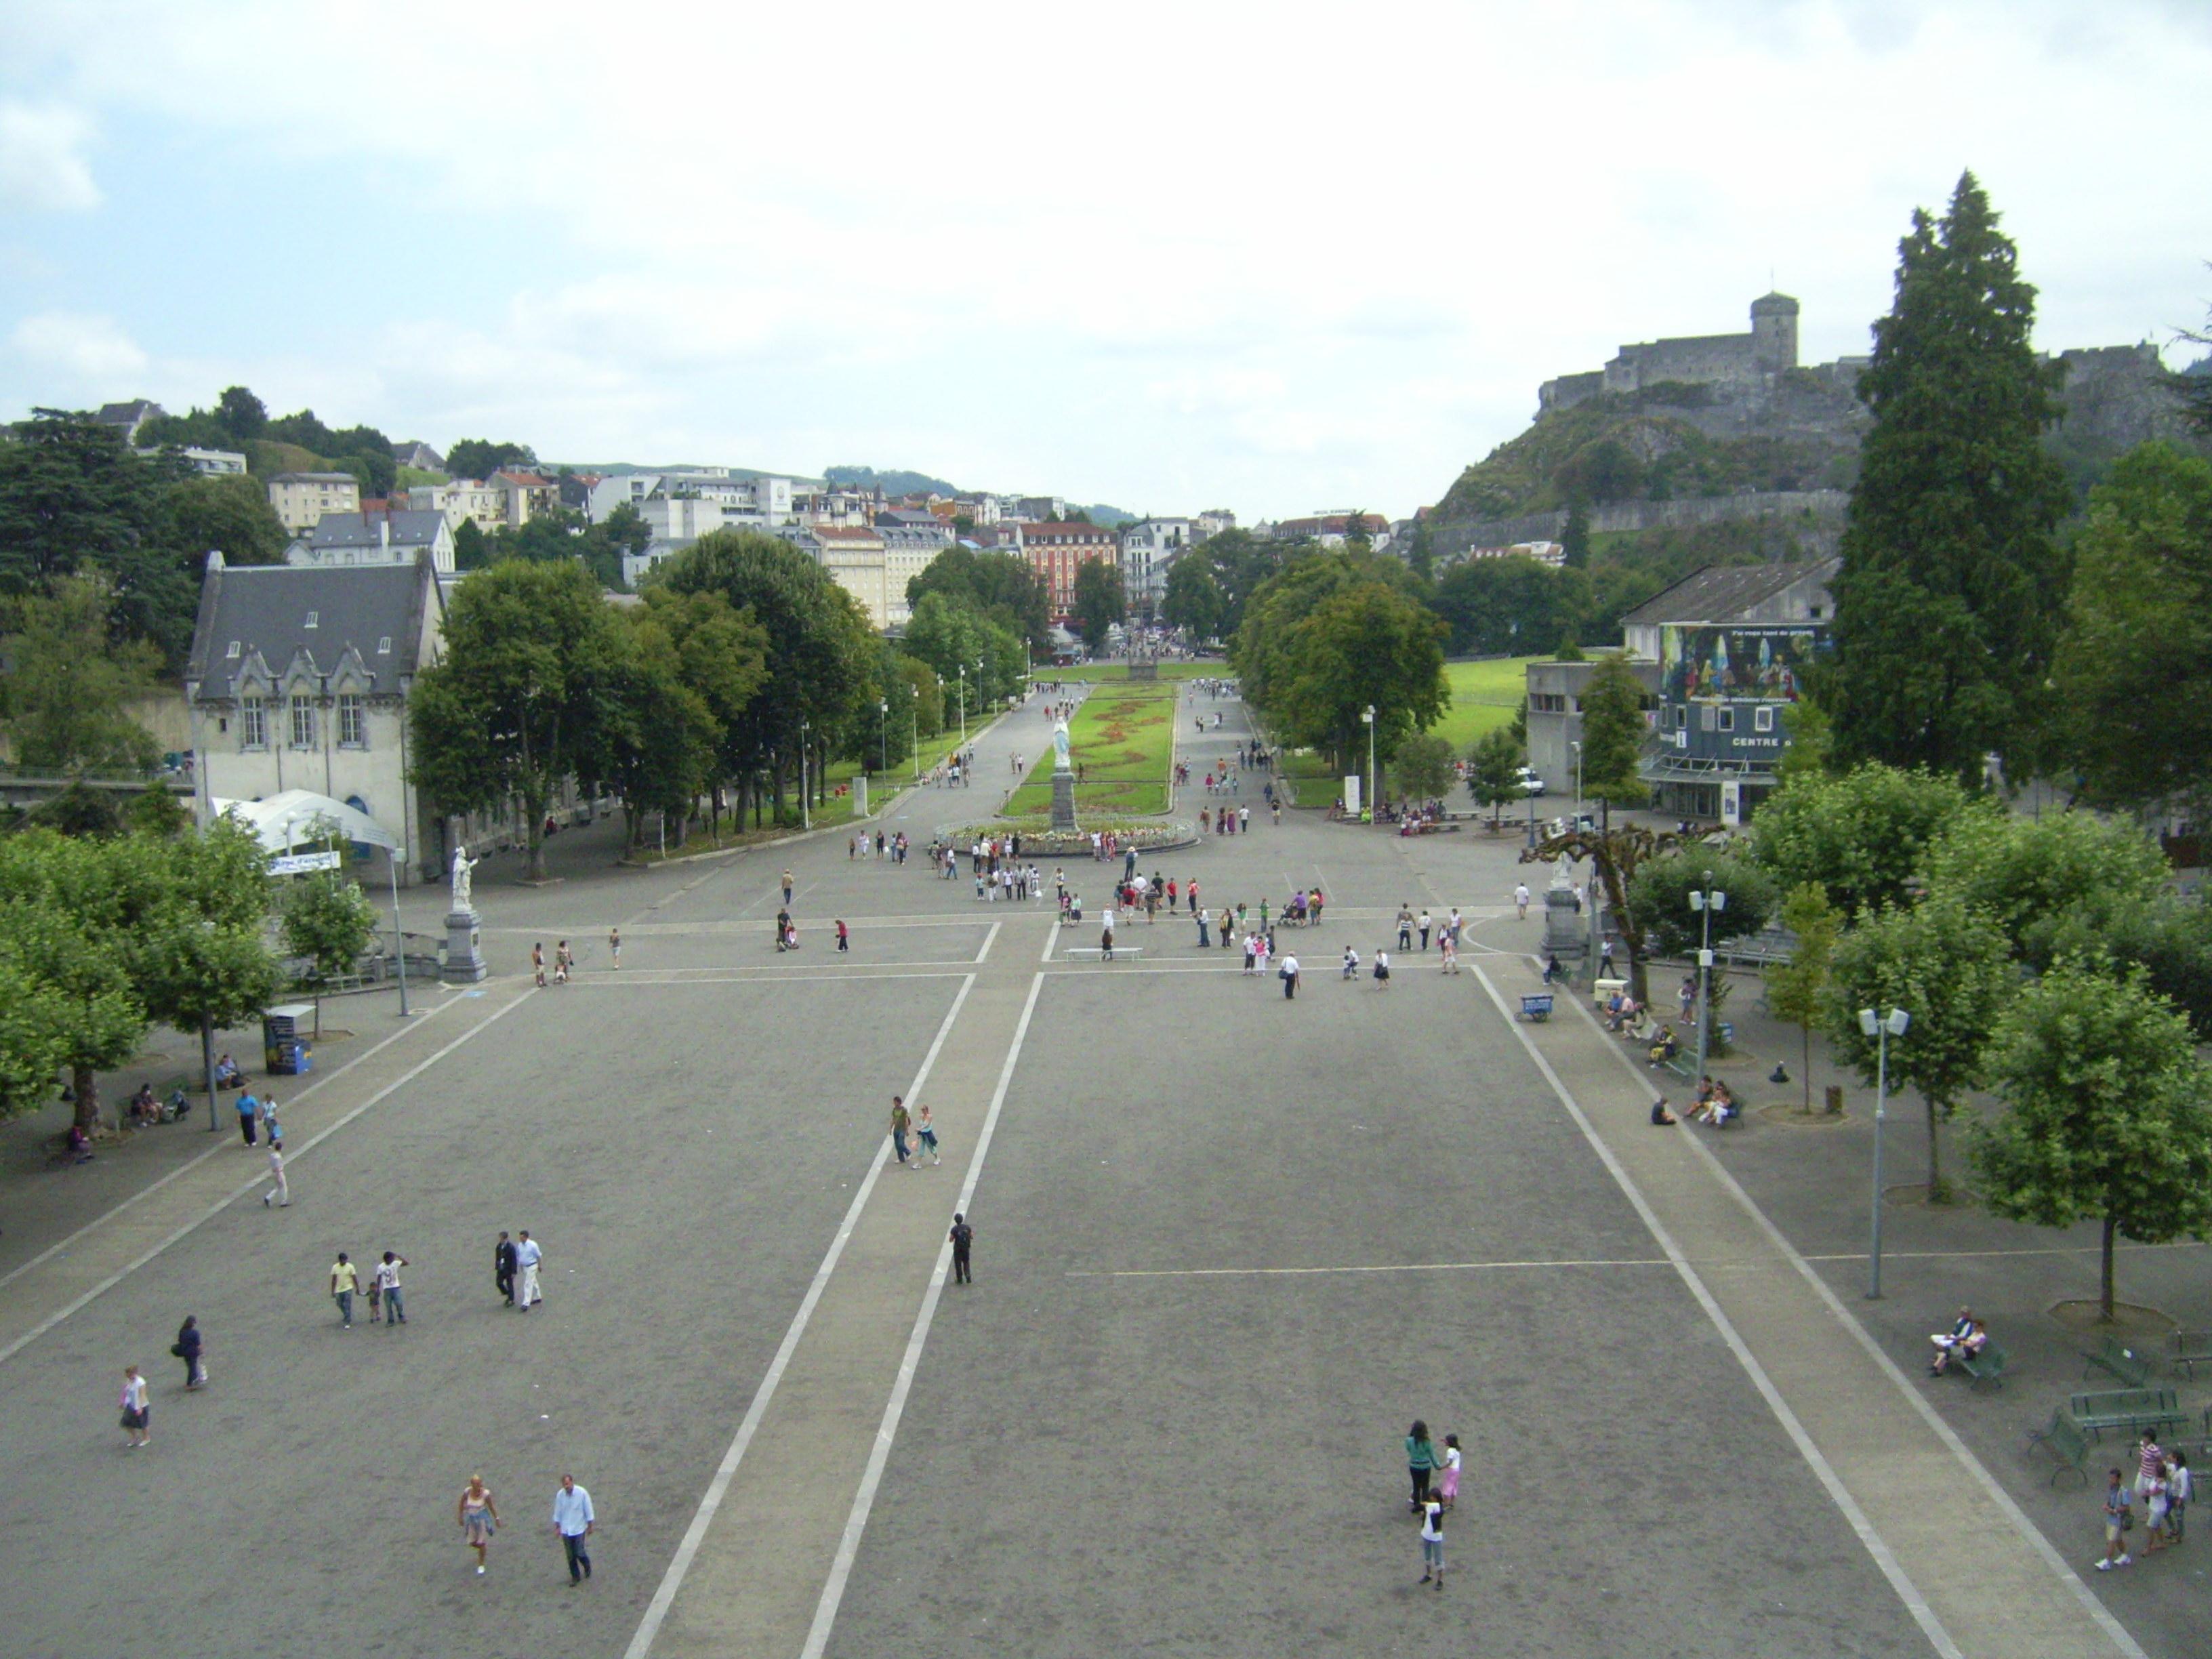 Lourdes, France, France, French, Landscape, Lourde, HQ Photo